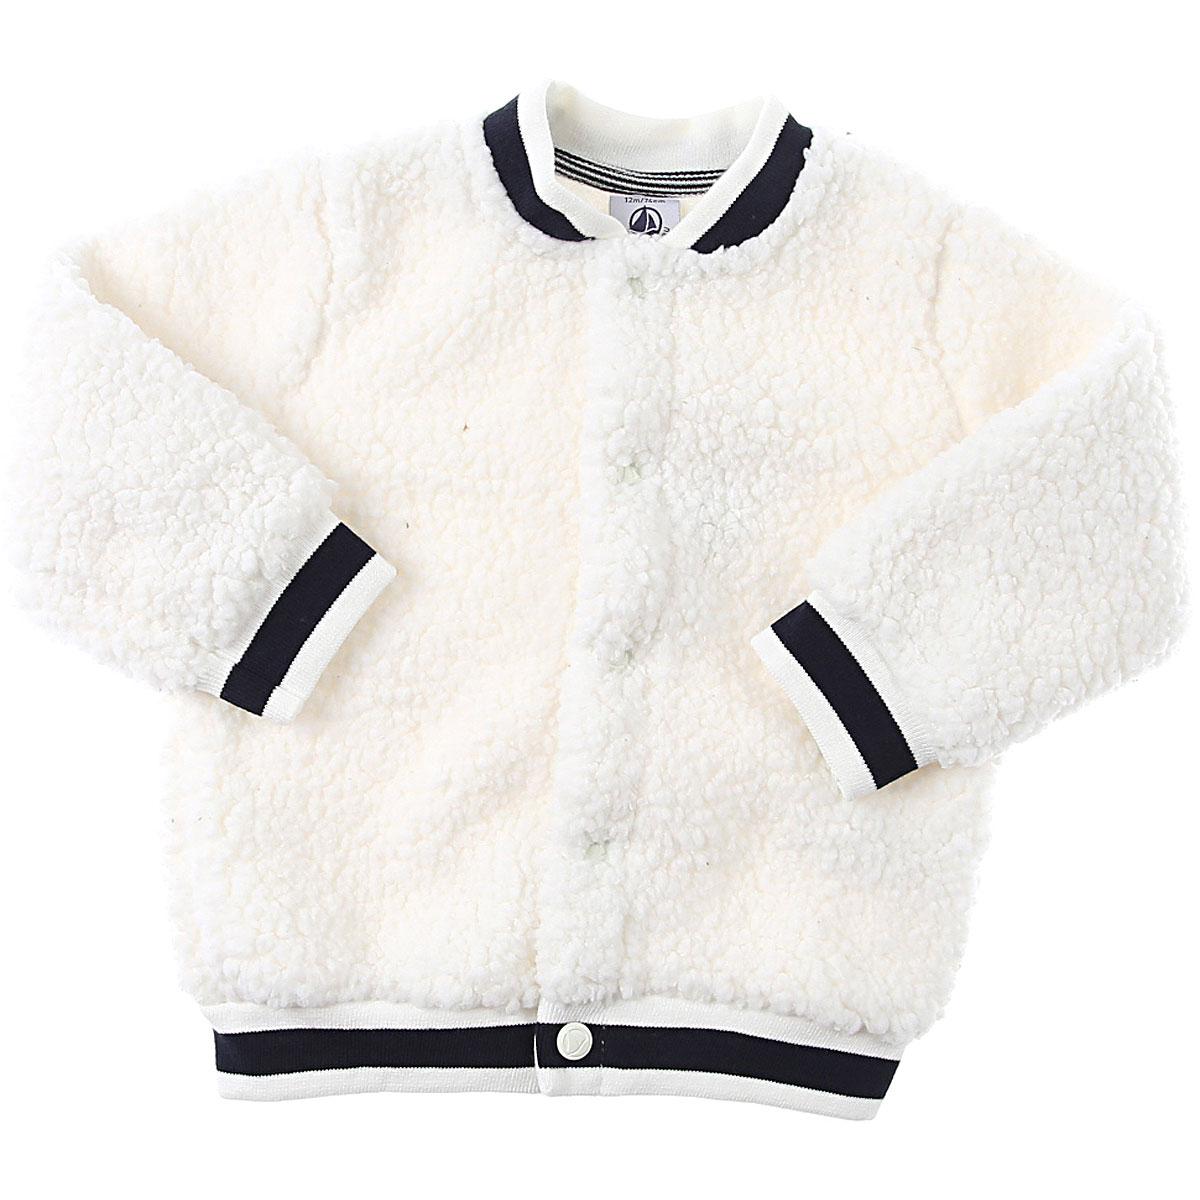 Petit Bateau Baby Sweatshirts & Hoodies for Girls On Sale, White, polyester, 2019, 12M 6M